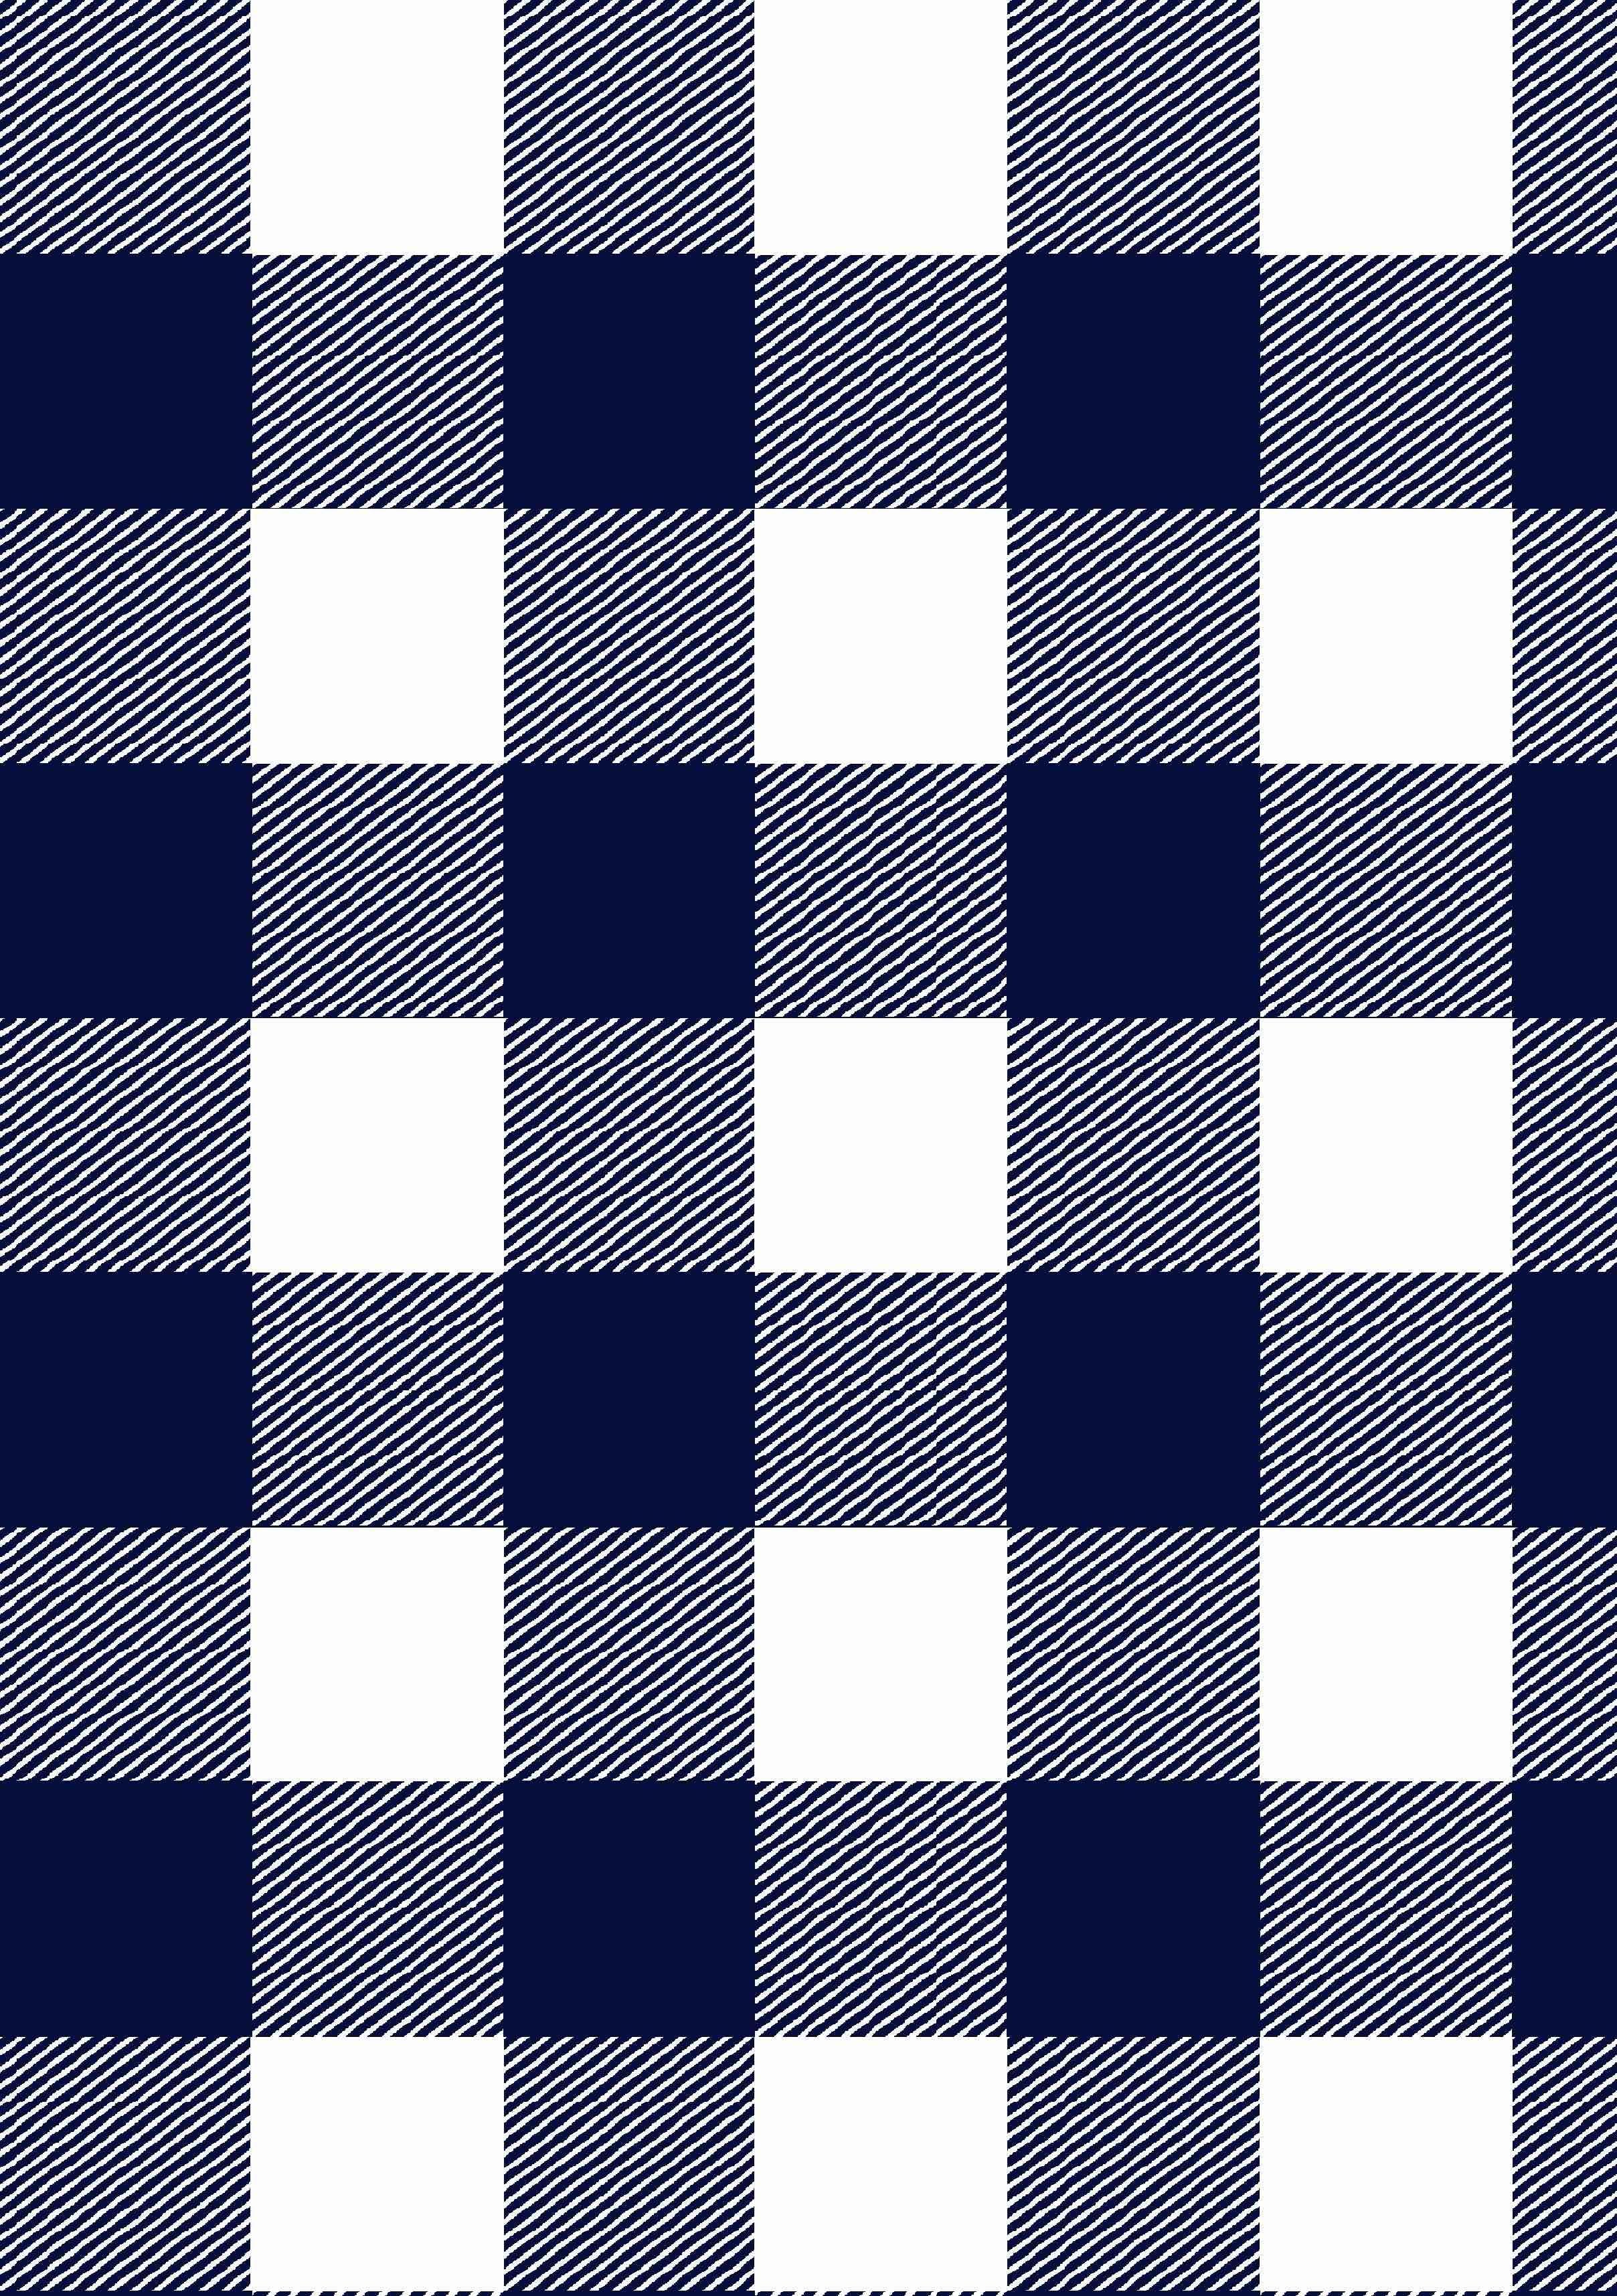 Draper James Navy Parton Check Blue Wallpaper Iphone Iphone Background Wallpaper Aesthetic Iphone Wallpaper